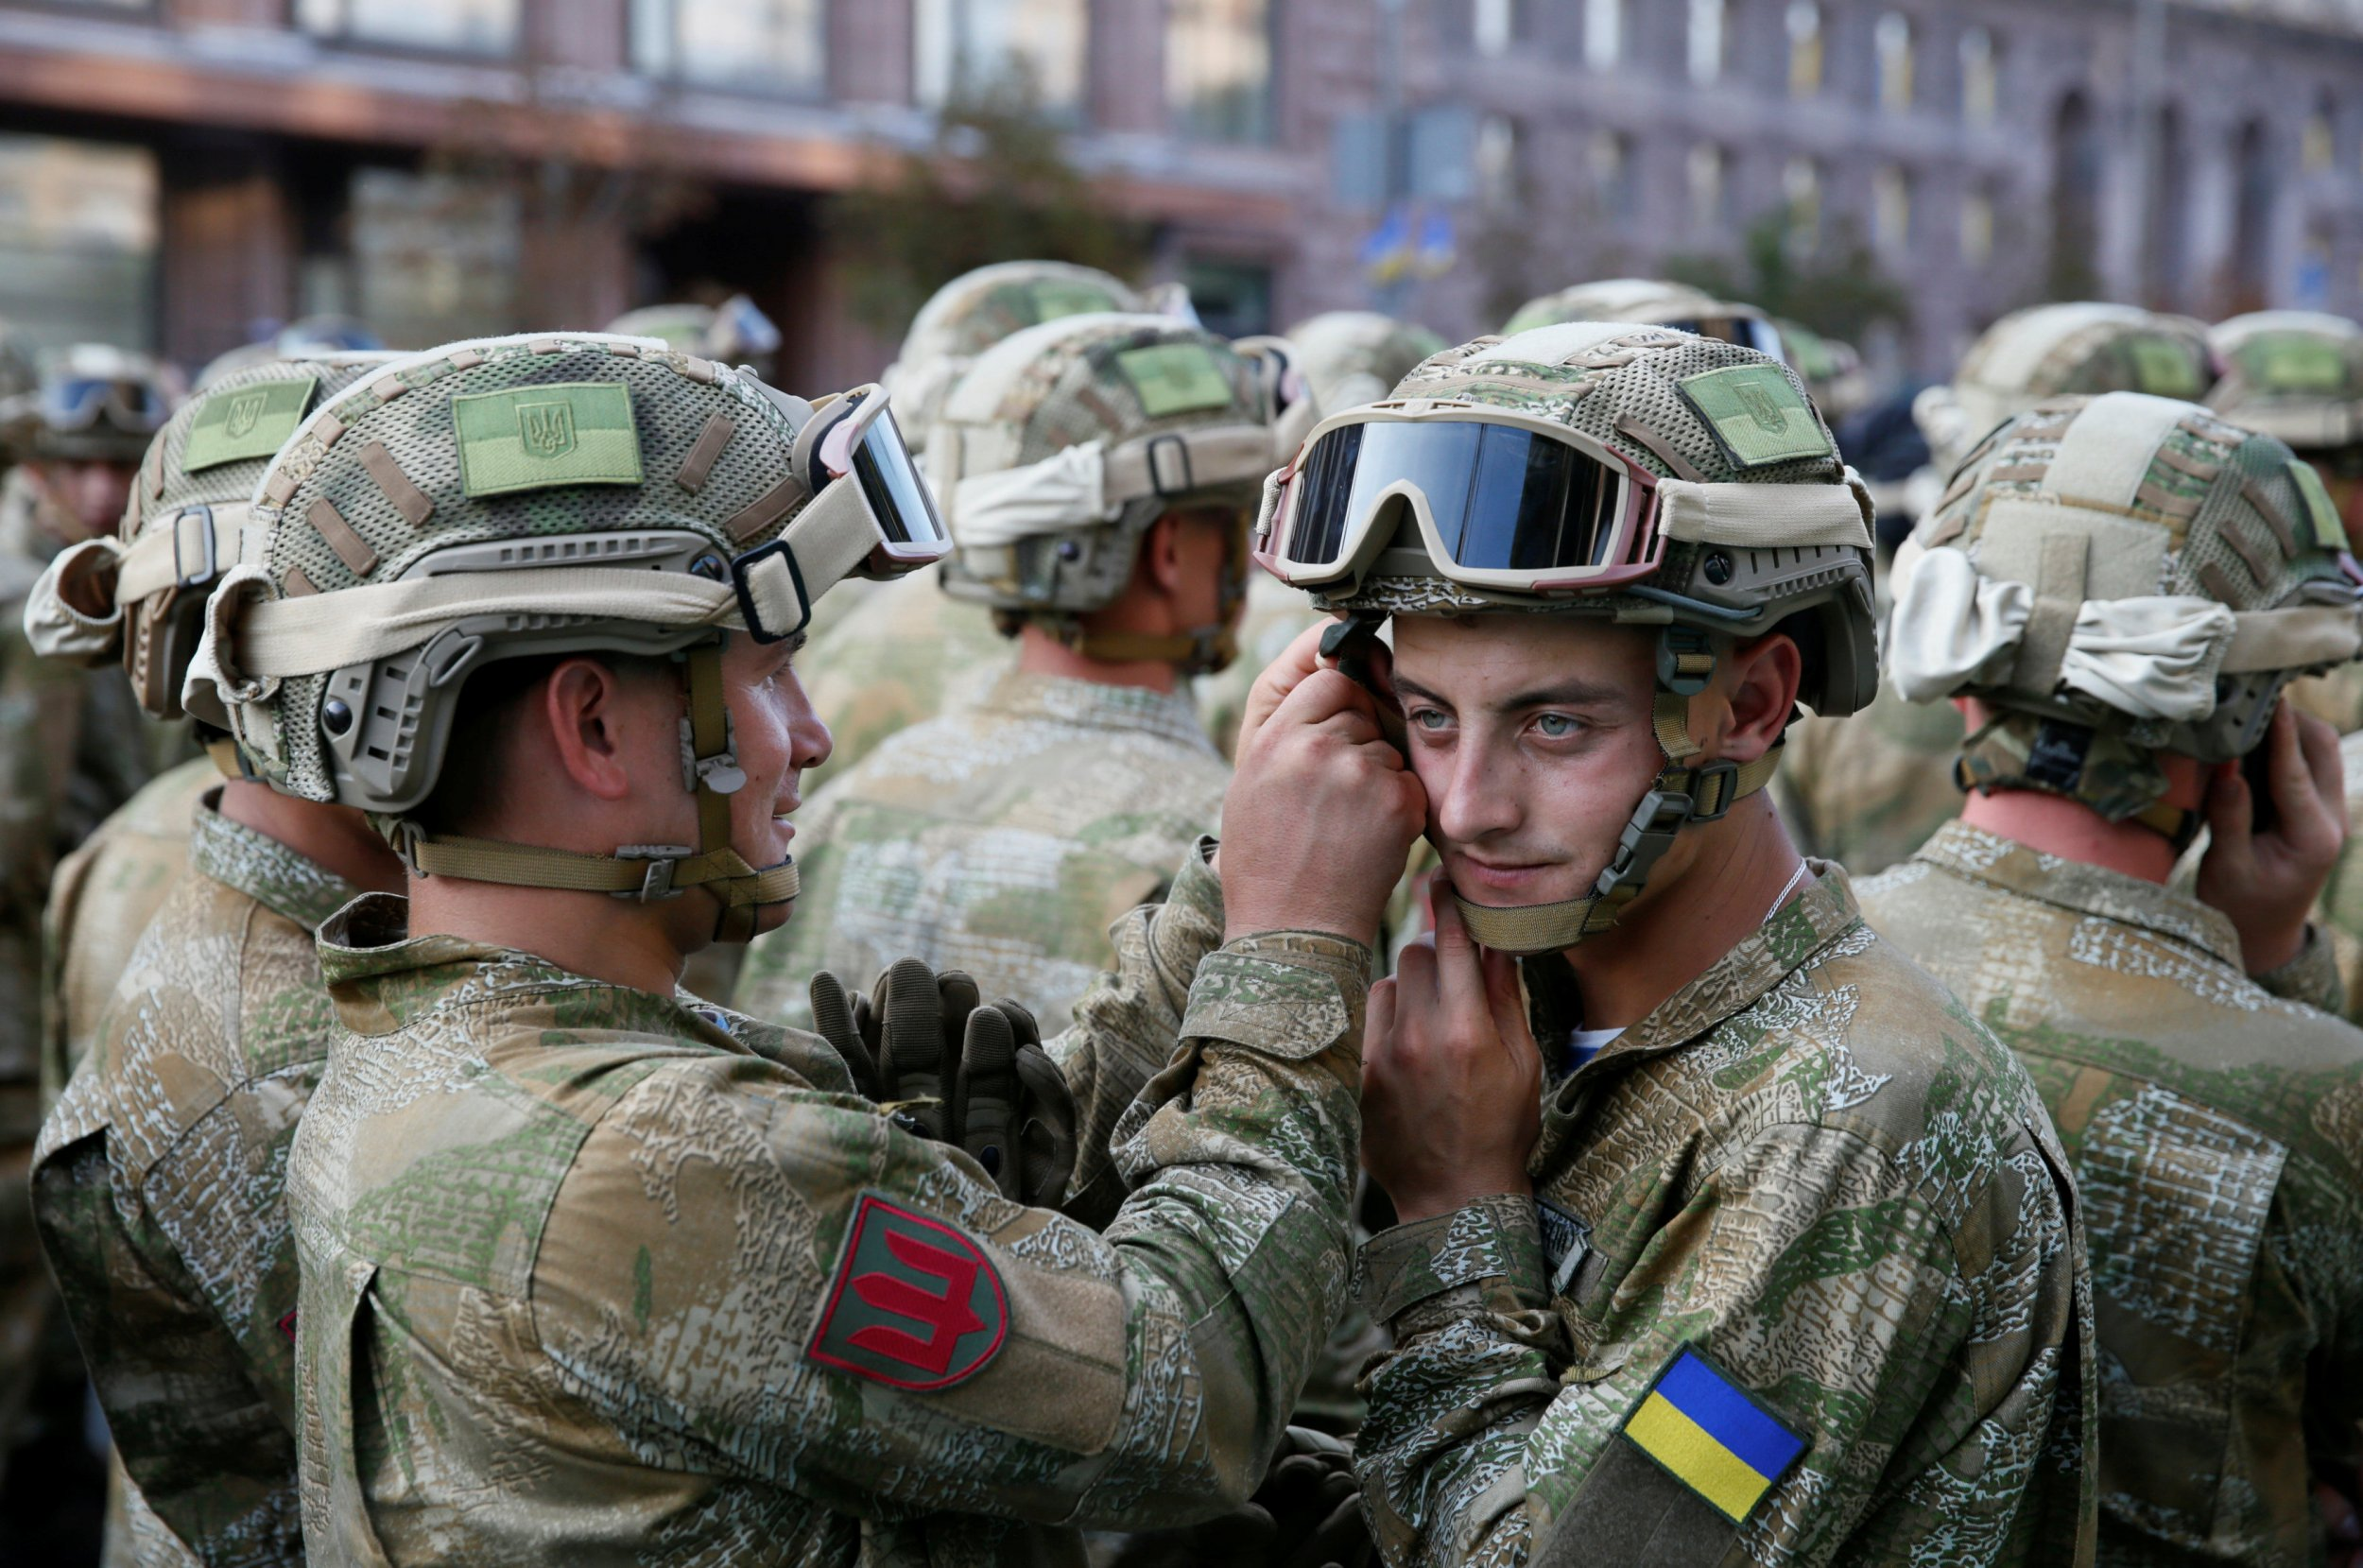 08_26_Ukraine_Trench_01